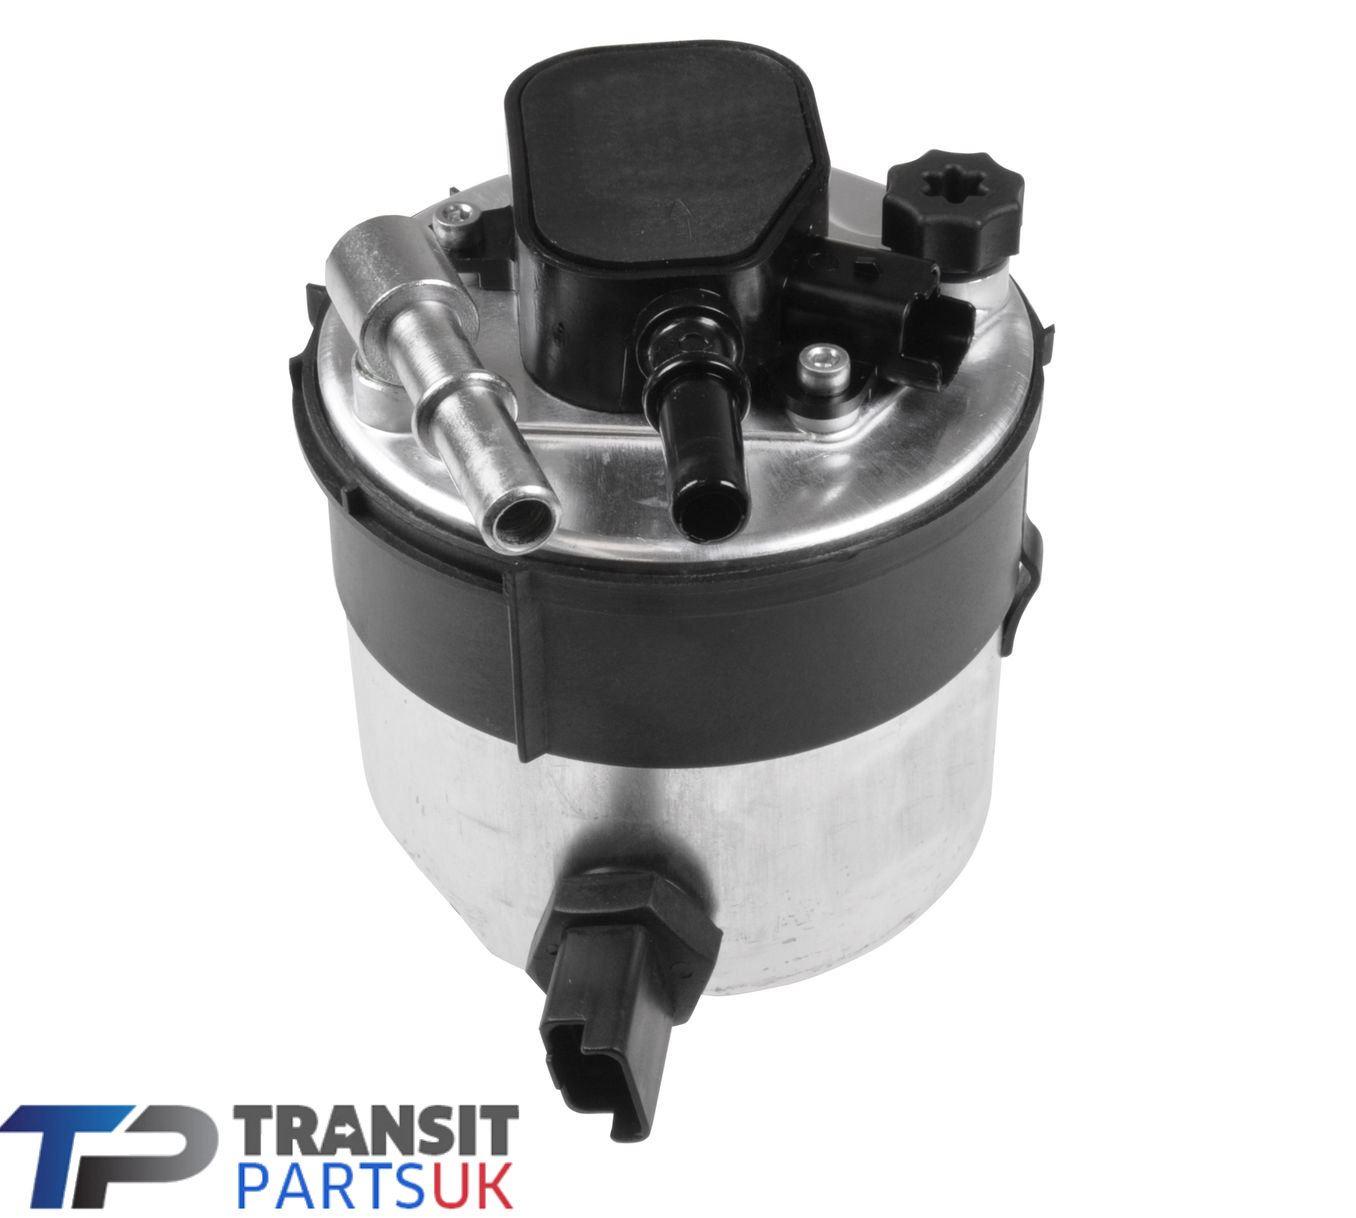 hight resolution of details about ford focus mk2 c max fiesta mk6 mk7 1 6 tdci diesel fuel filter 2005 2012